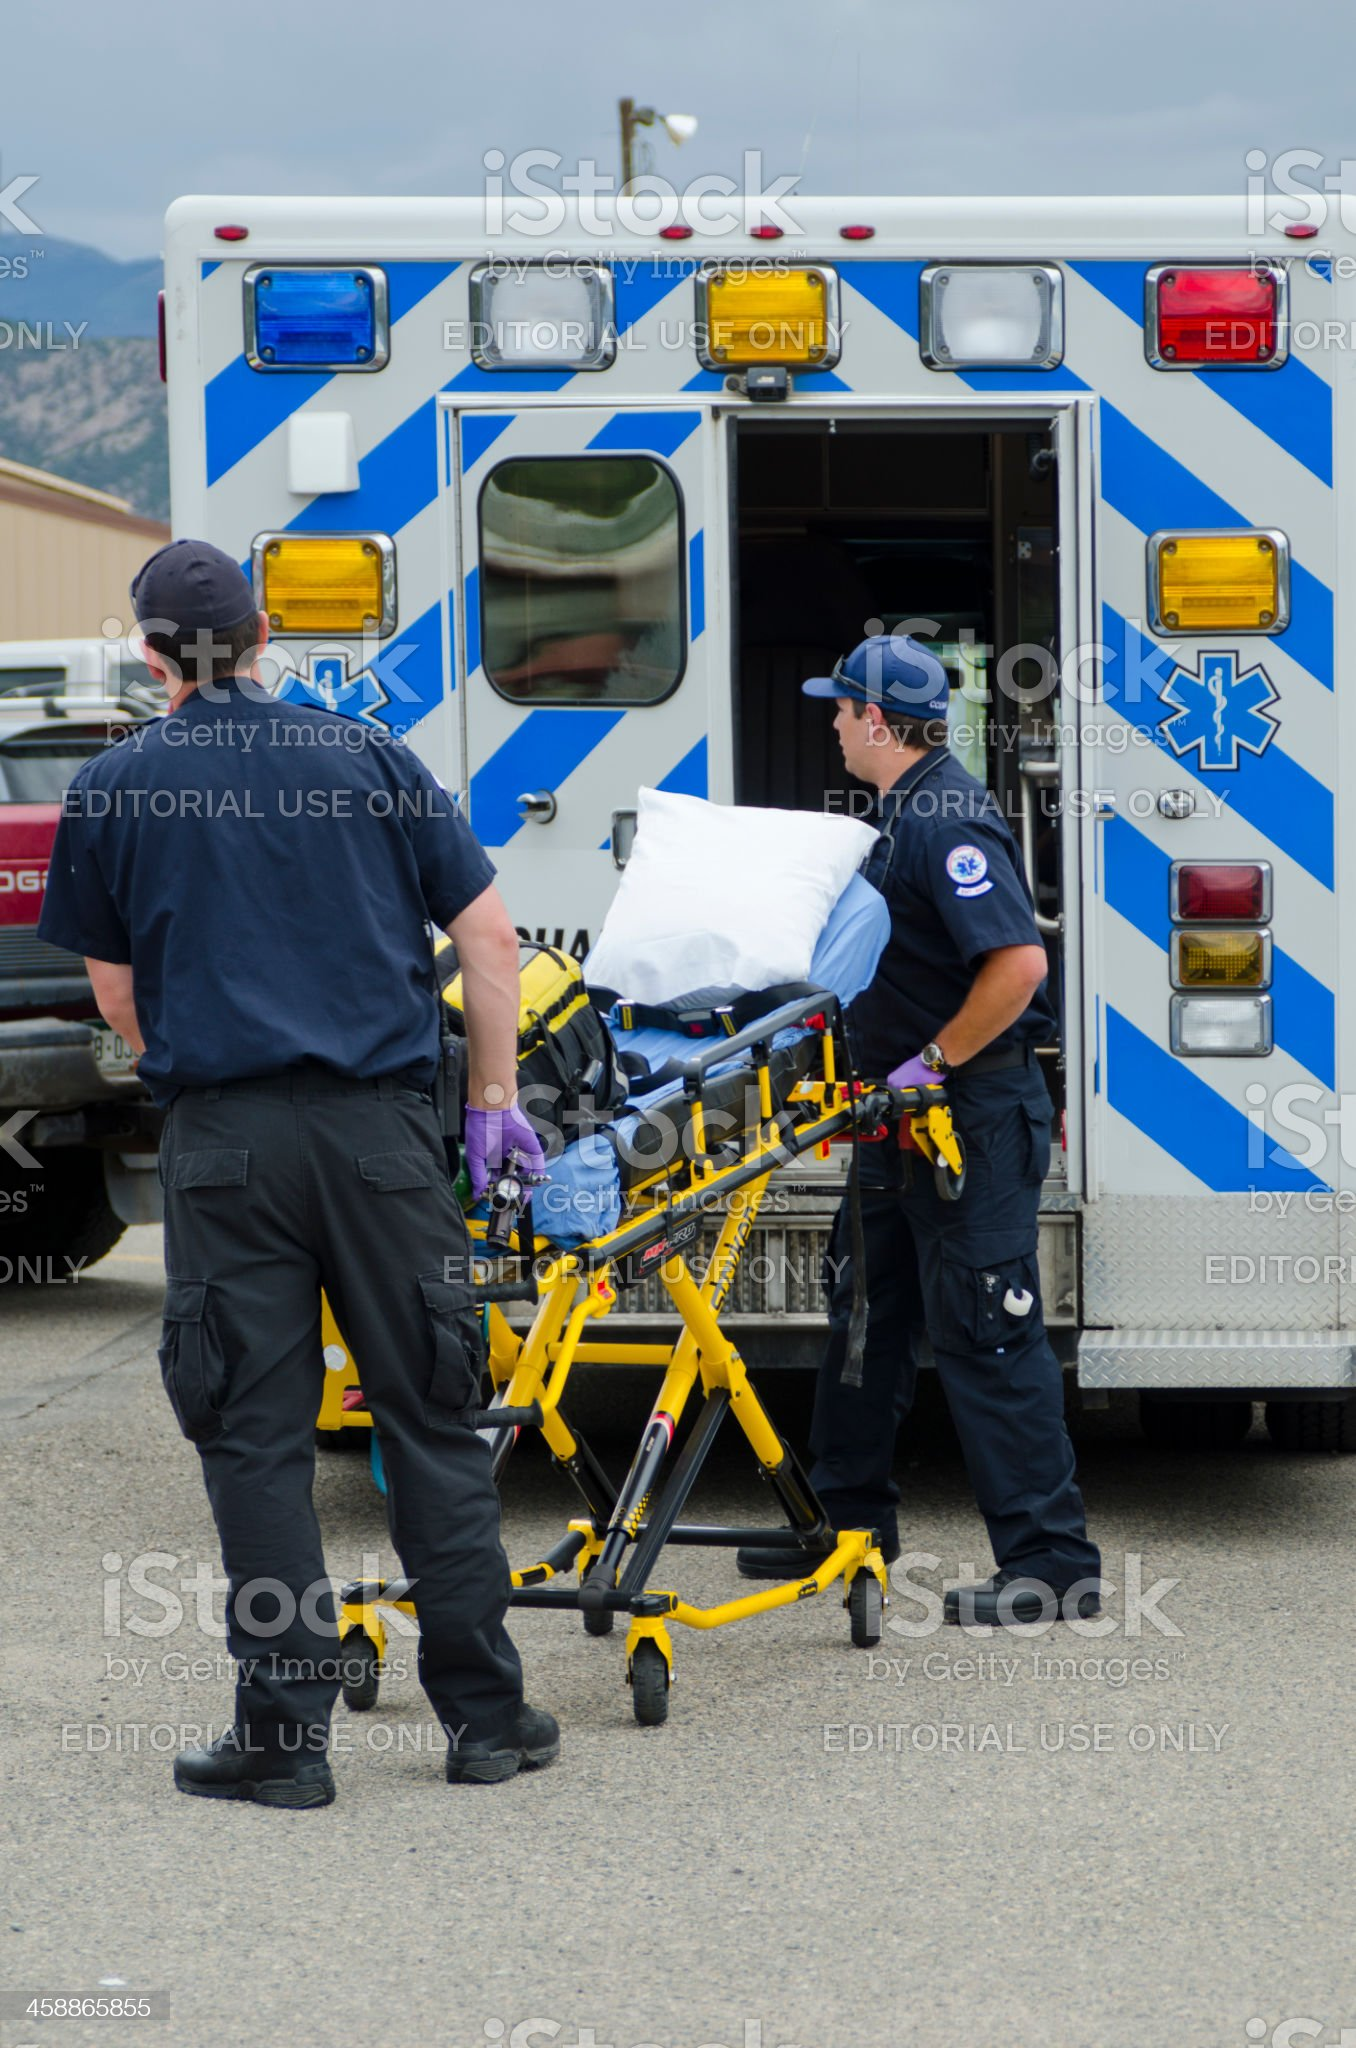 Emergency Ambulance Call royalty-free stock photo